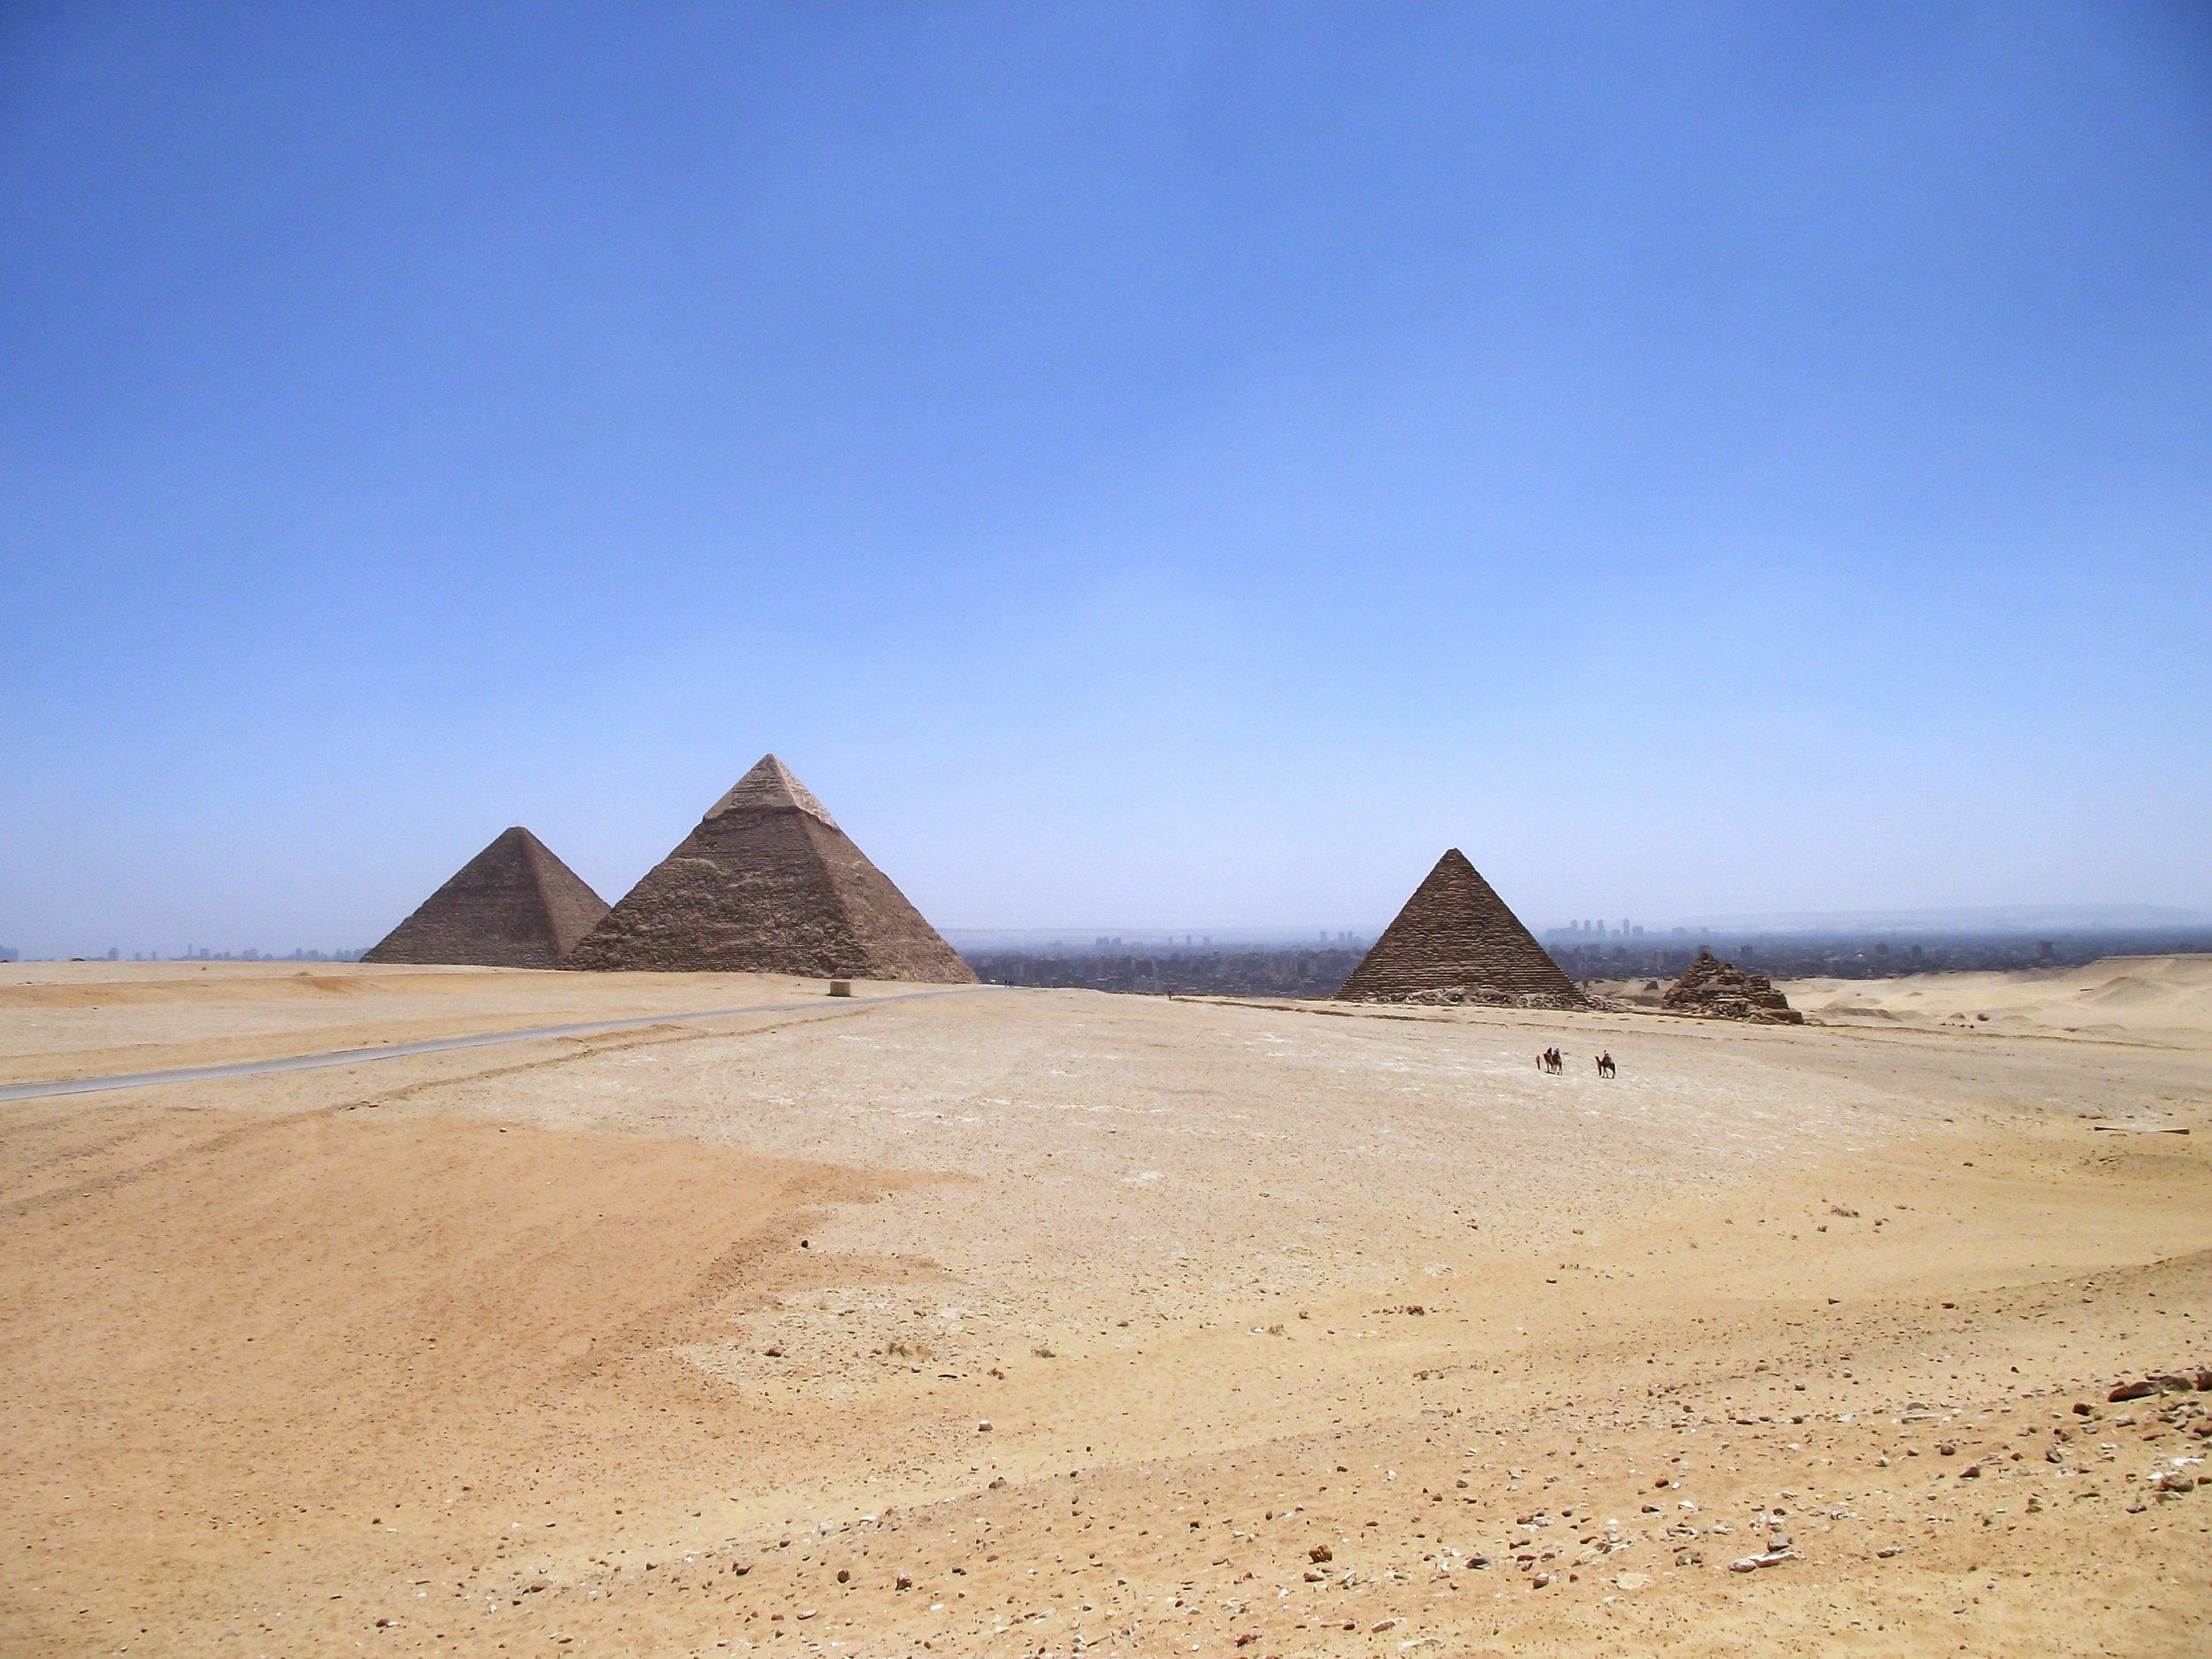 Egypt-Cairo-Pyramids-of-Giza-2.jpg